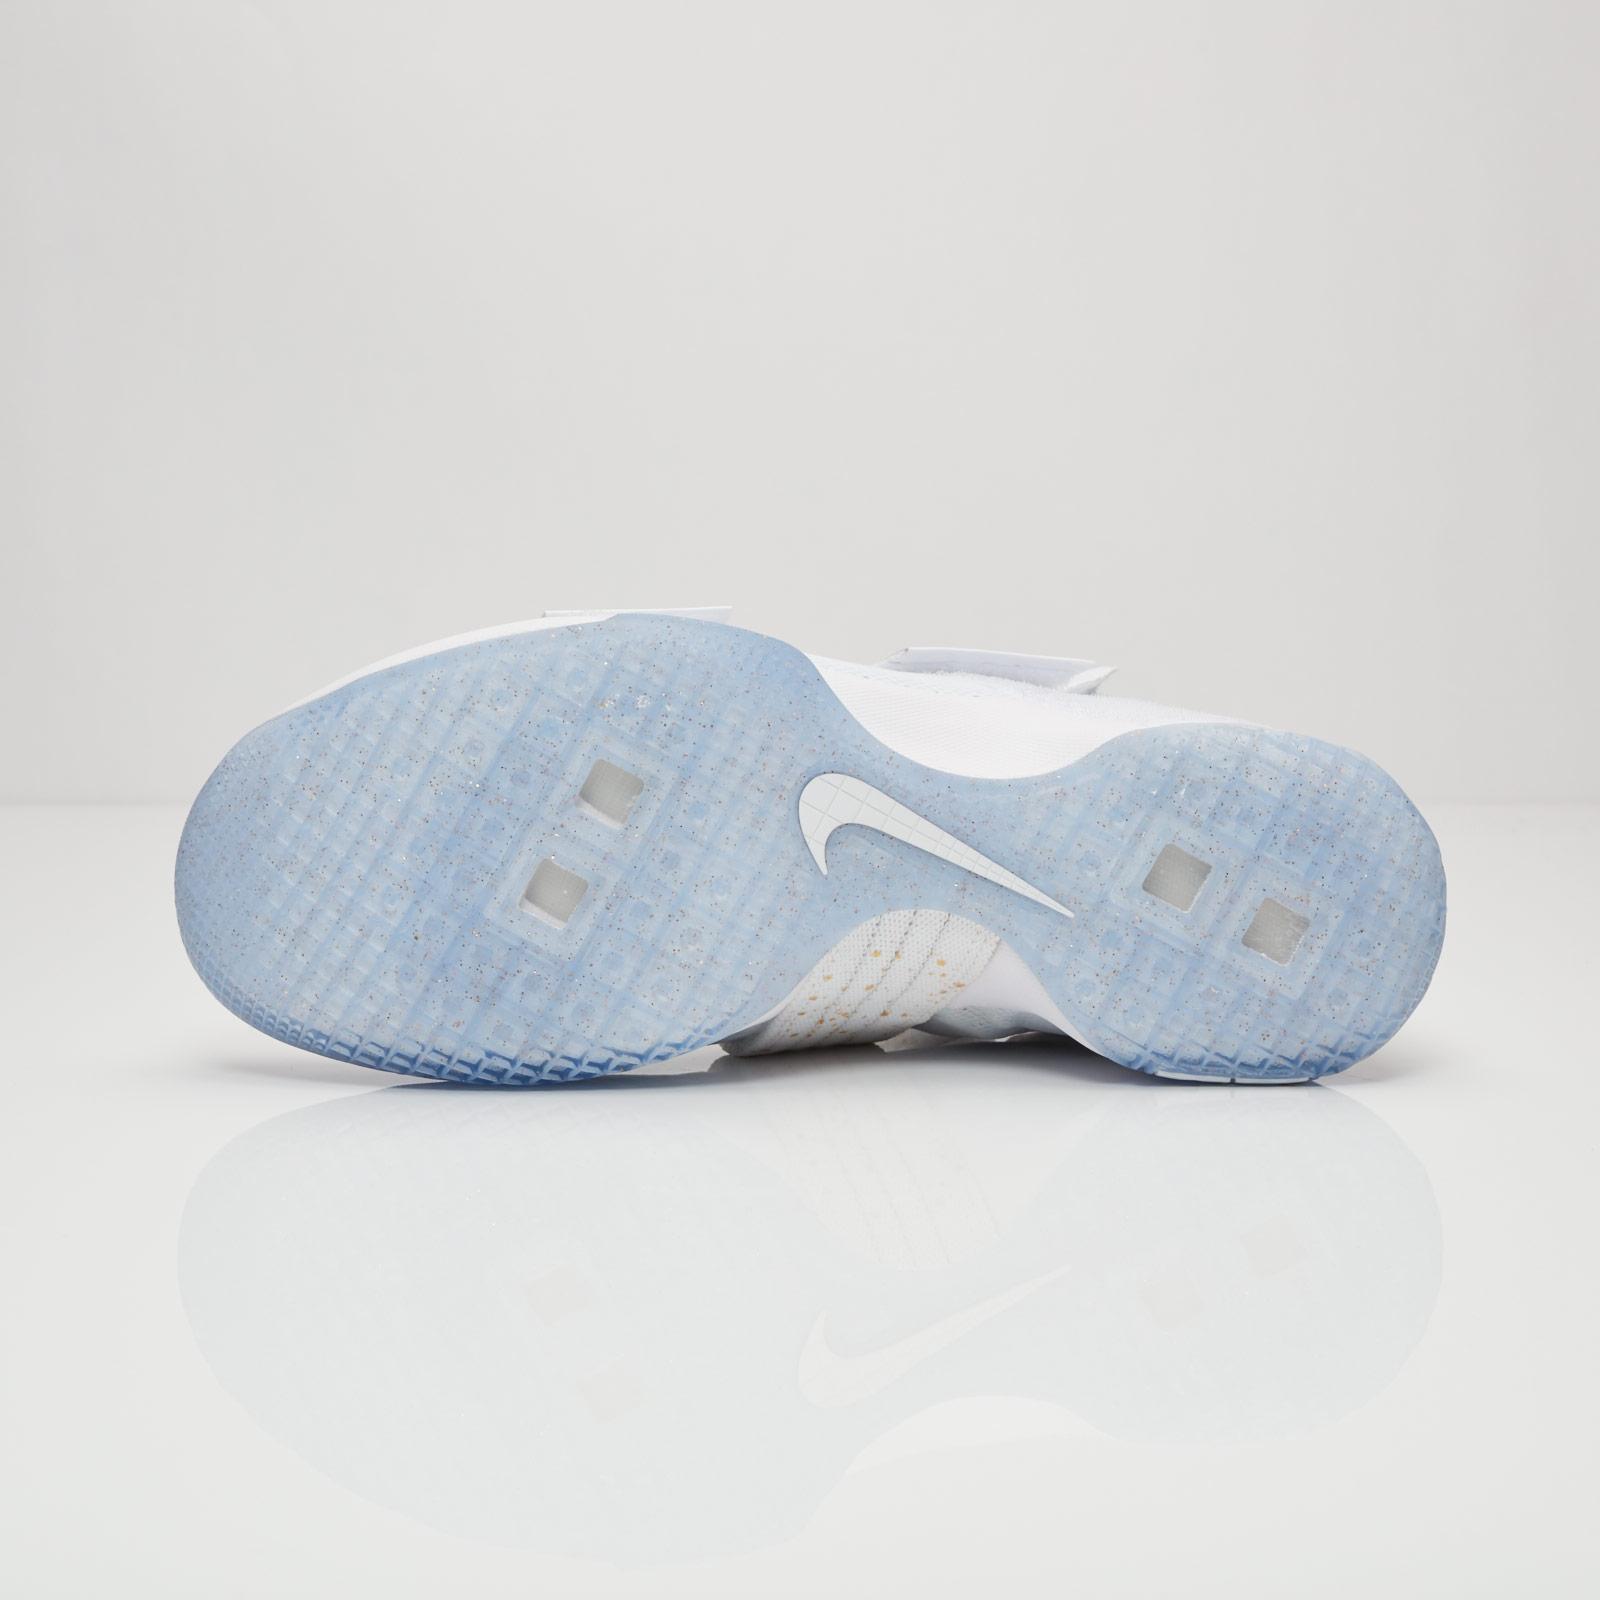 da2f86420ff0f Nike LeBron Soldier 10 SFG Limited - 883333-174 - Sneakersnstuff ...